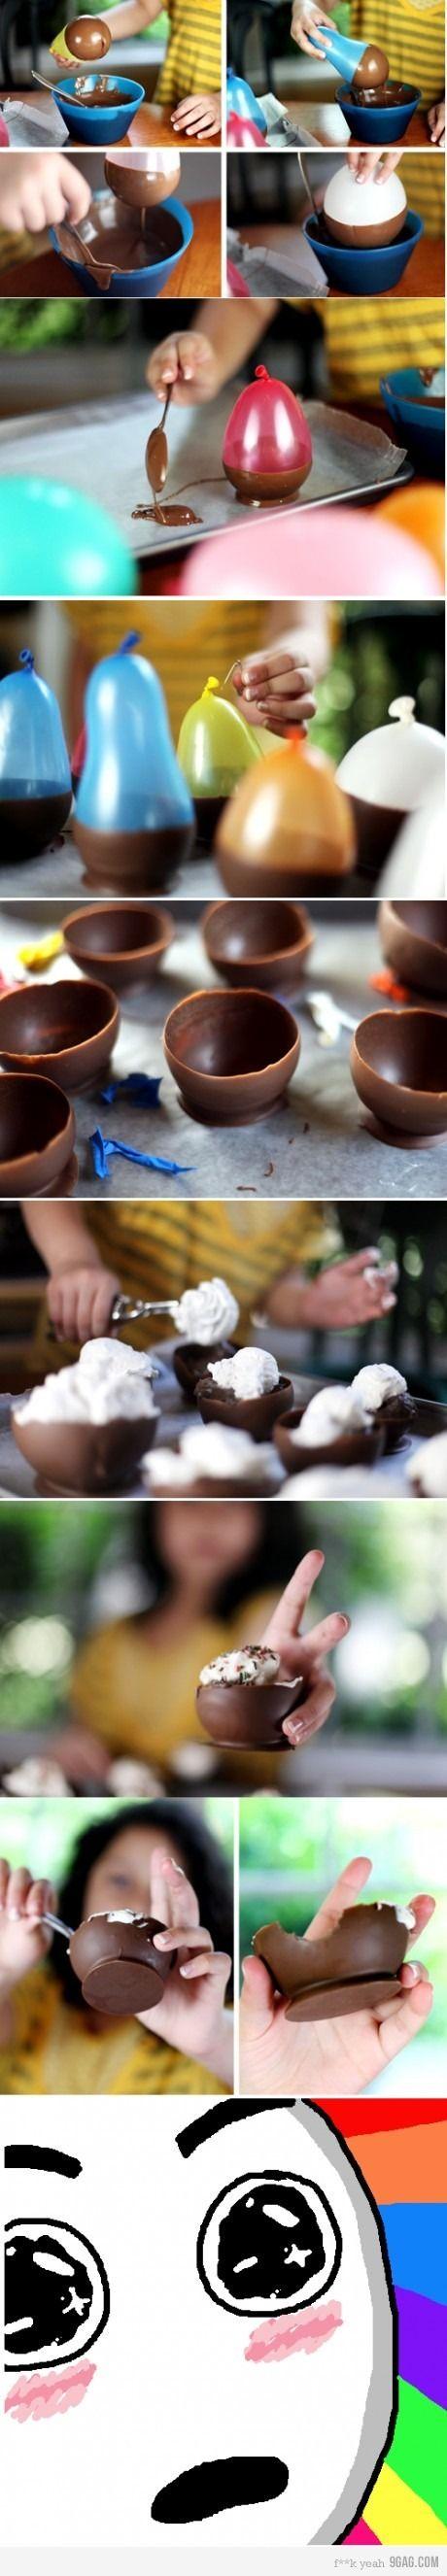 thats so fun!!!: Chocolates Ice Cream, Good Ideas, Birthday Parties, Chocolates Cups, Ice Cream Cups, Chocolates Desserts, Chocolates Bowls, Cool Ideas, Great Ideas